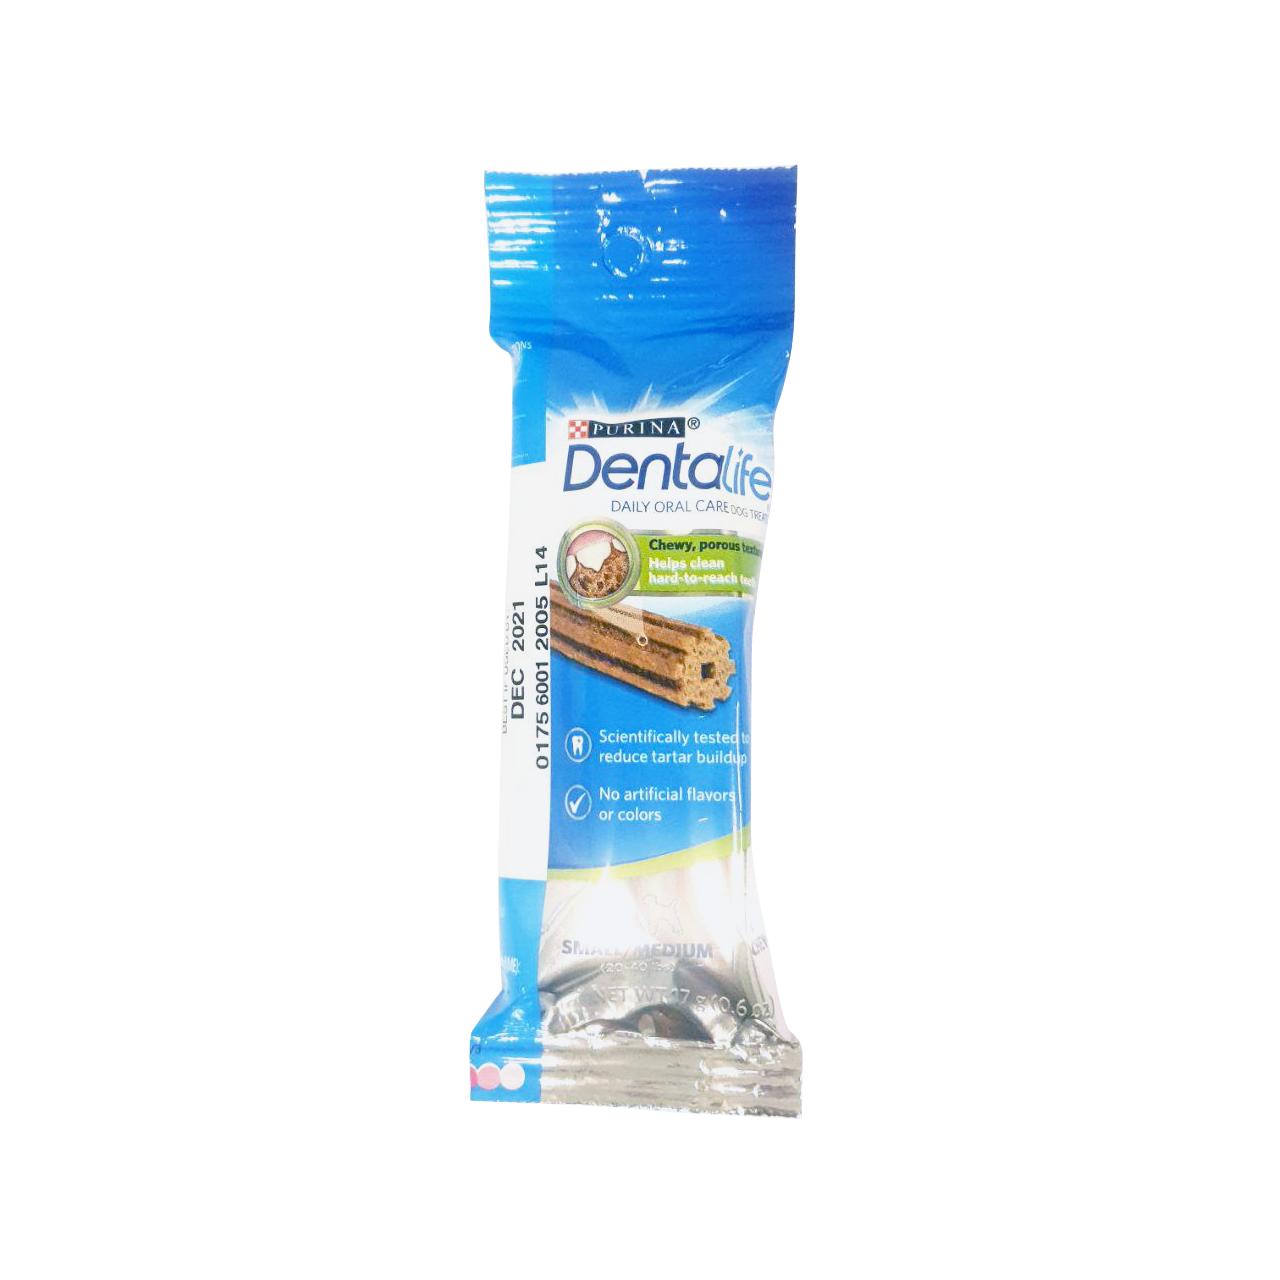 Dental Life Mini Dog Treat sample